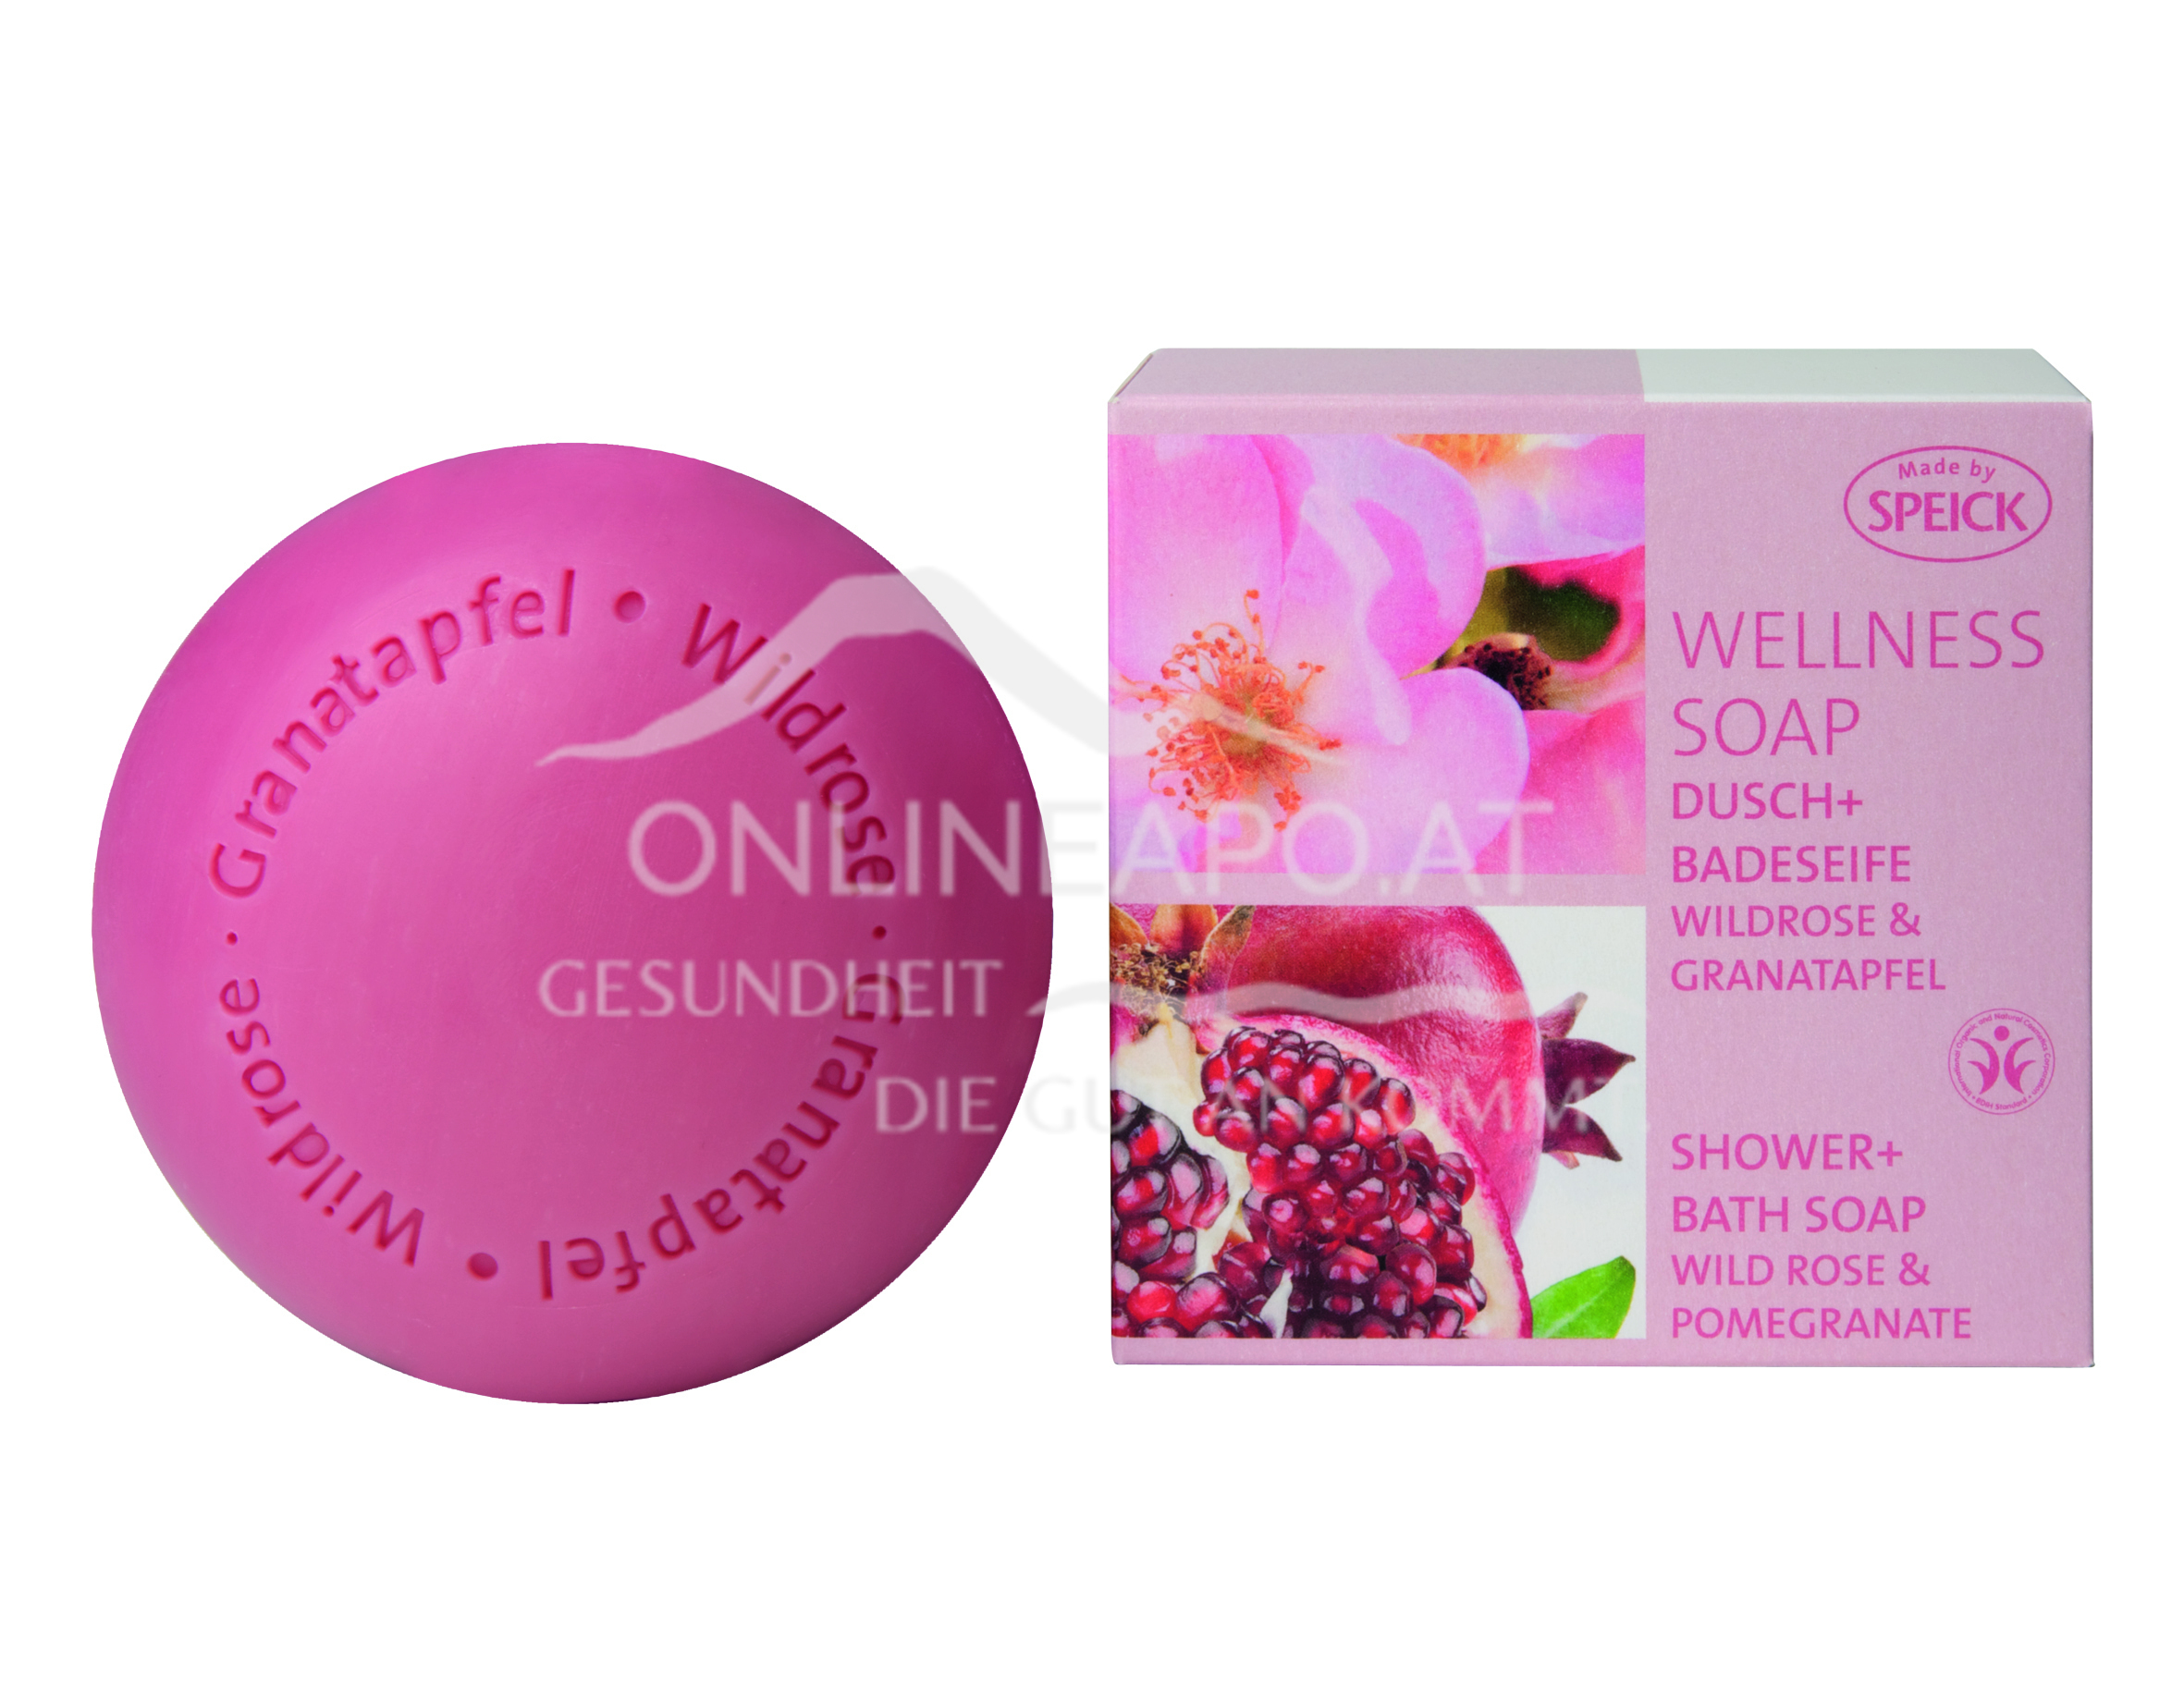 Made by Speick Wellness Soap Wildrose & Granatapfel